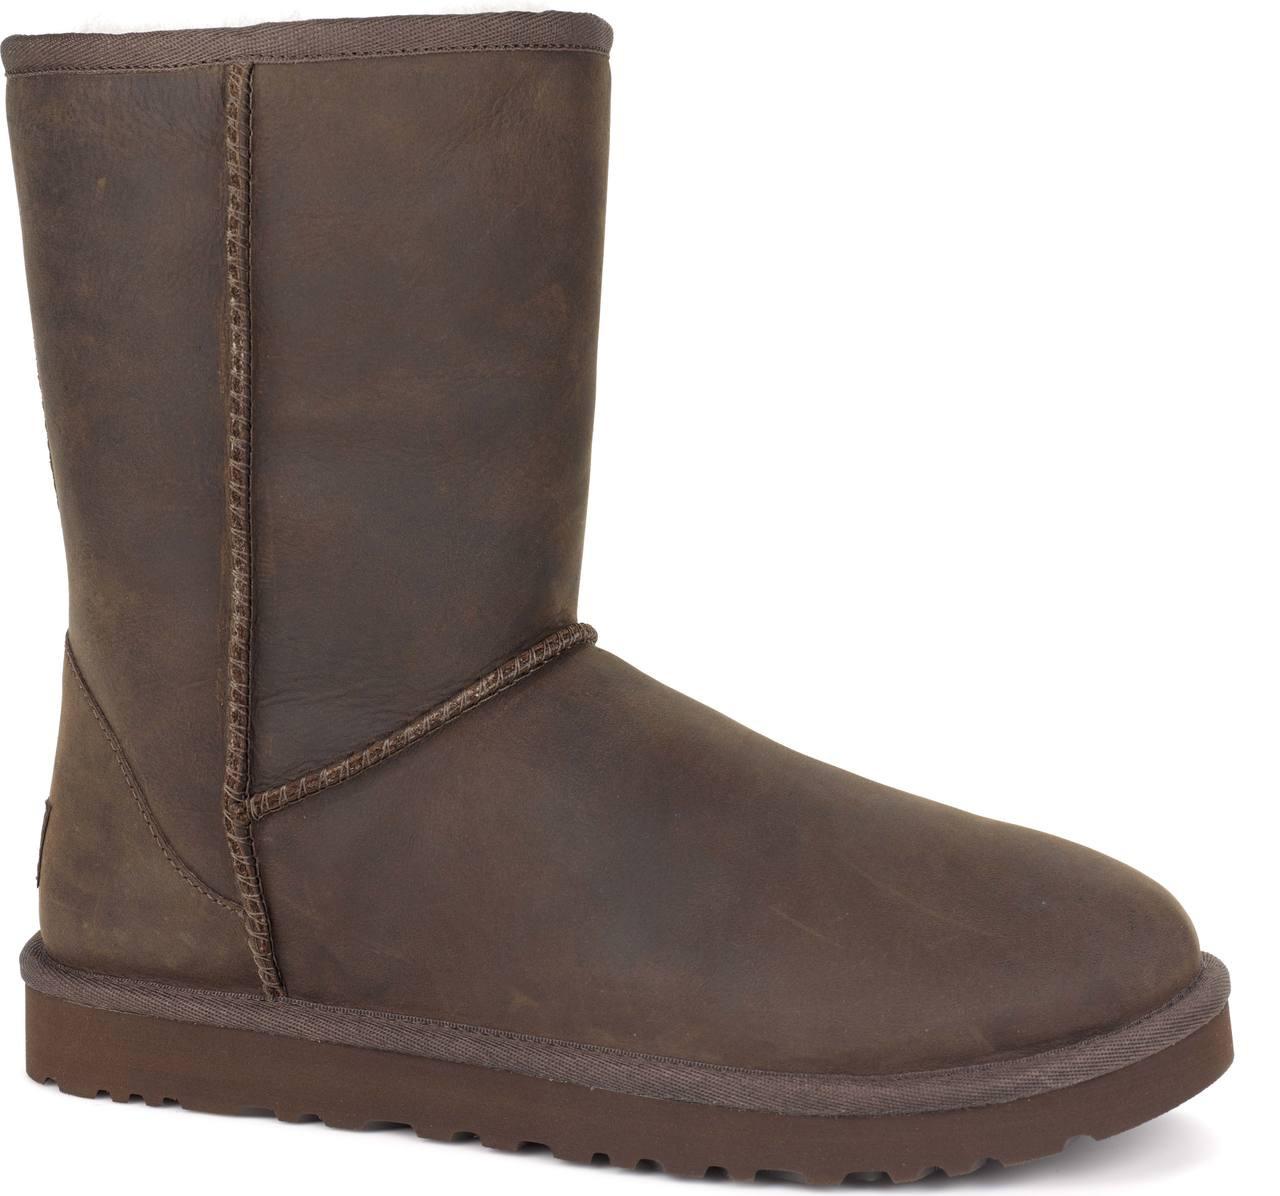 ... Boots; UGG Women's Classic Short Leather. Black. Black; Black TL;  Brownstone ...